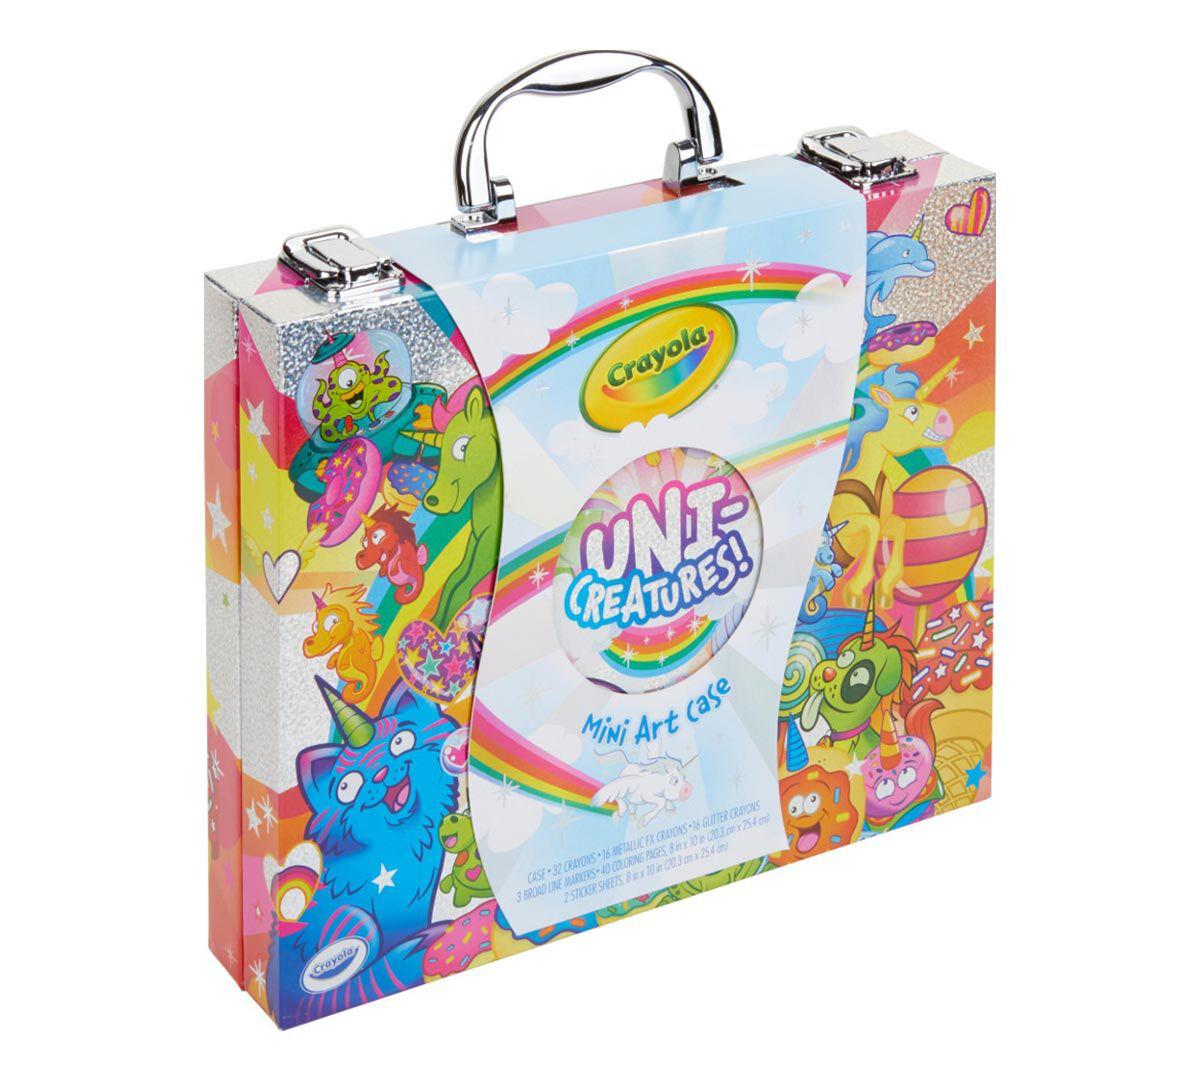 Crayola Uni Creatures Art Case Unicorn Coloring Pages